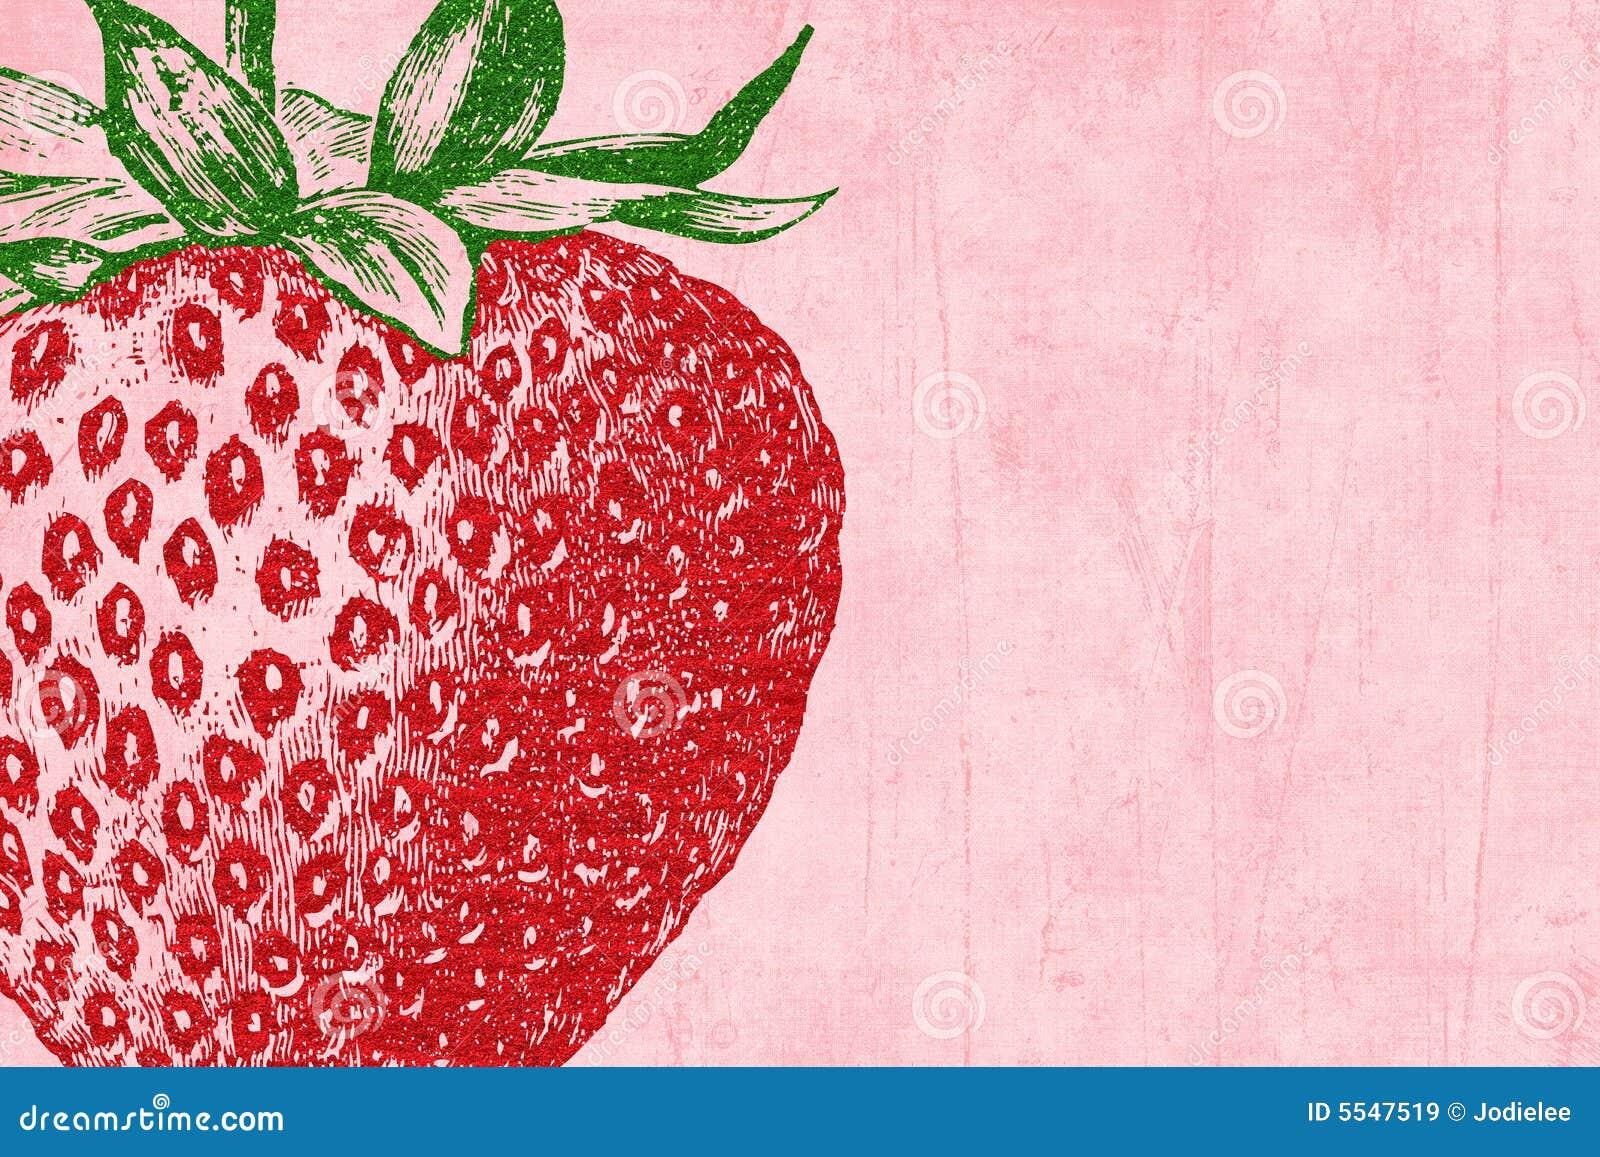 How to scrapbook with glitter - Strawberry Glitter Scrapbook Background